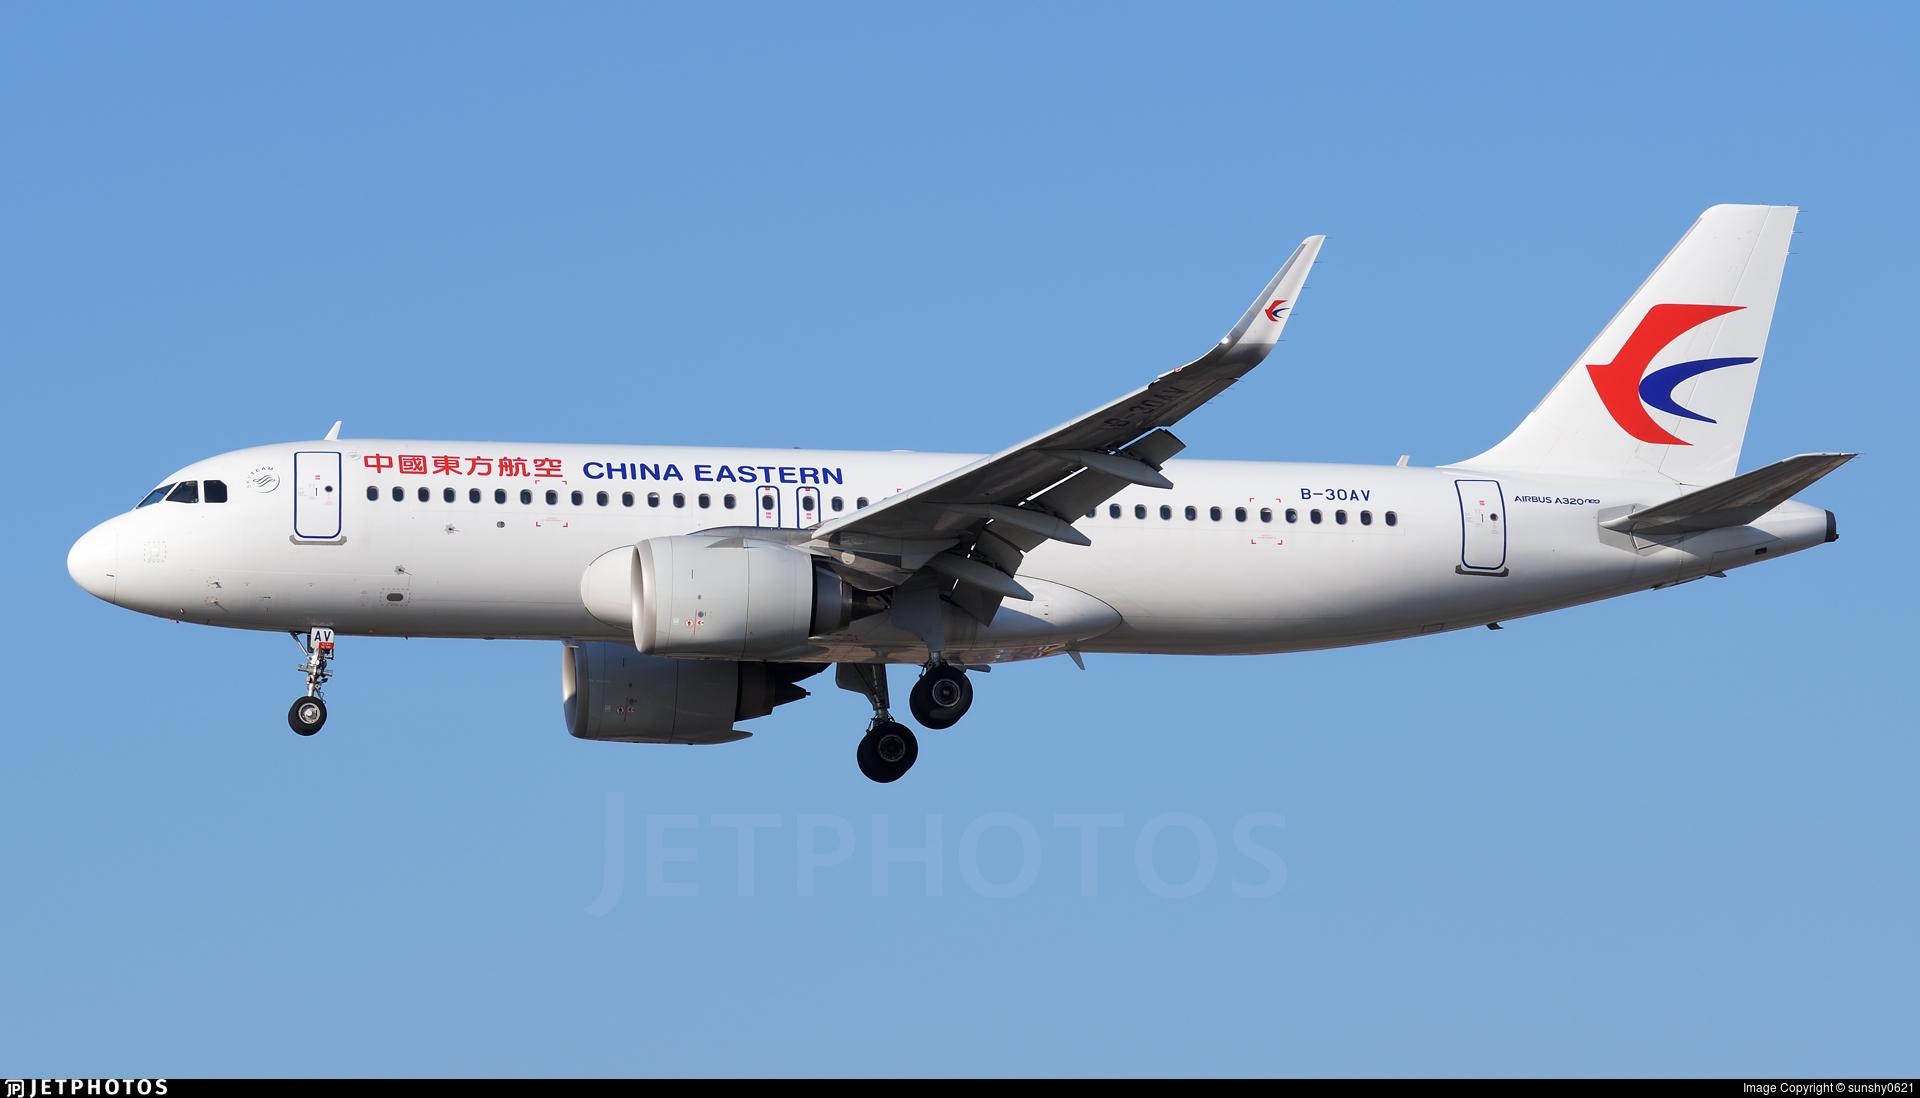 B-30AV - Airbus A320-251N - China Eastern Airlines